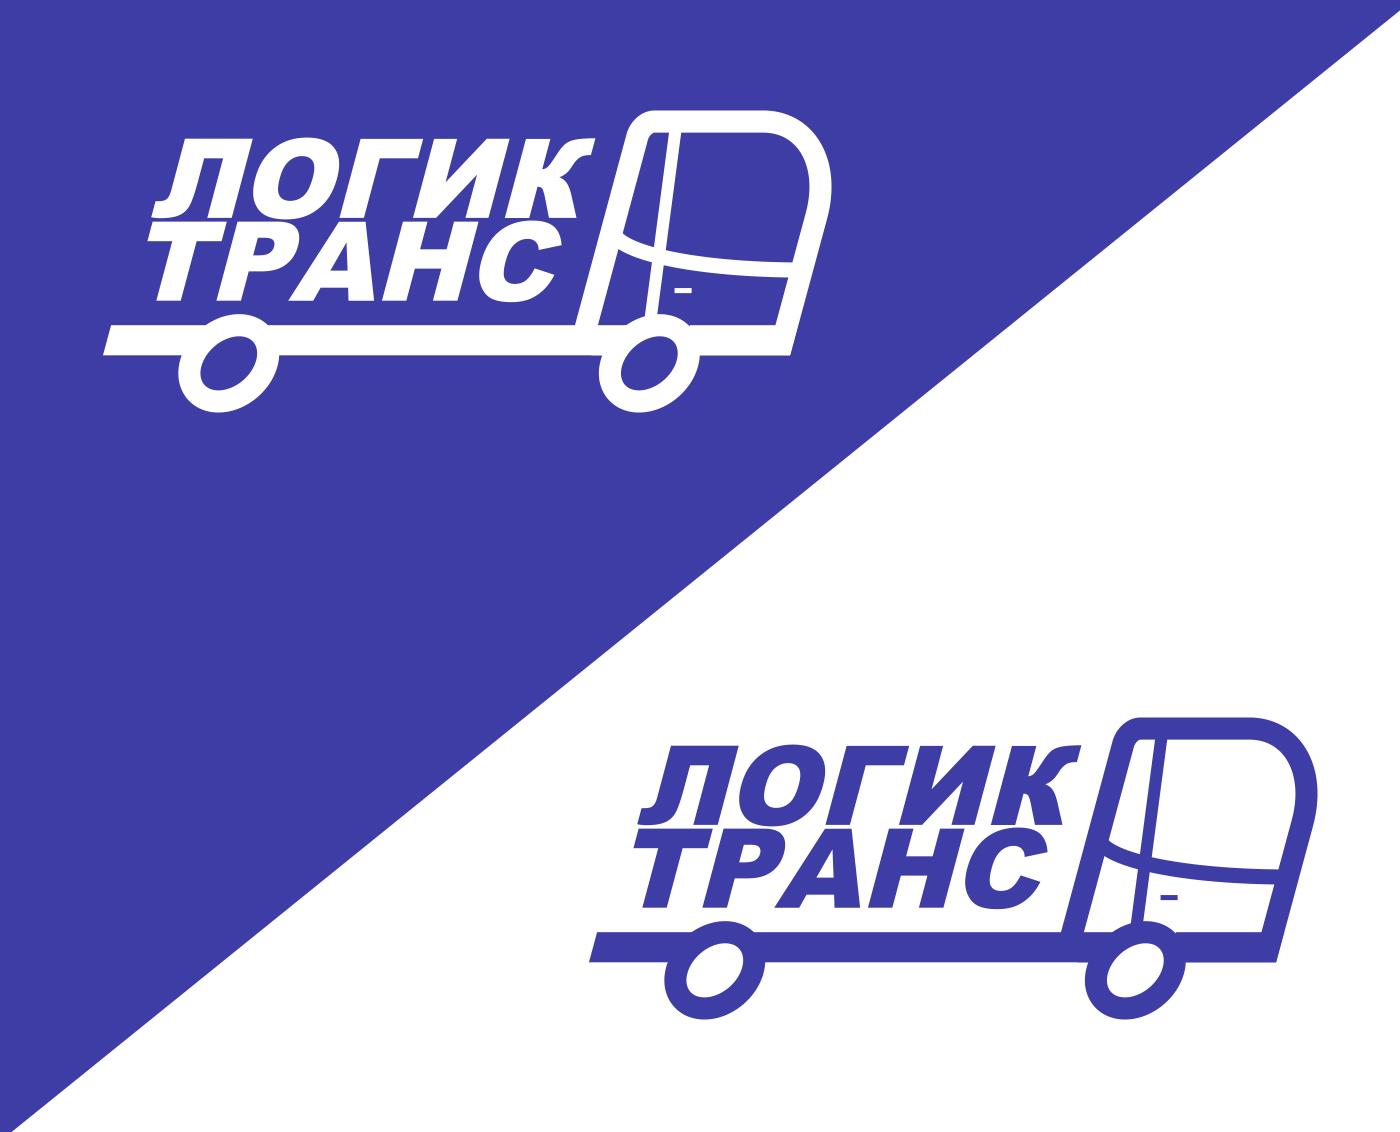 Дизайн сайта транспортно-экспедиторской компании ЛогикТранс фото f_1535a47f06279808.jpg